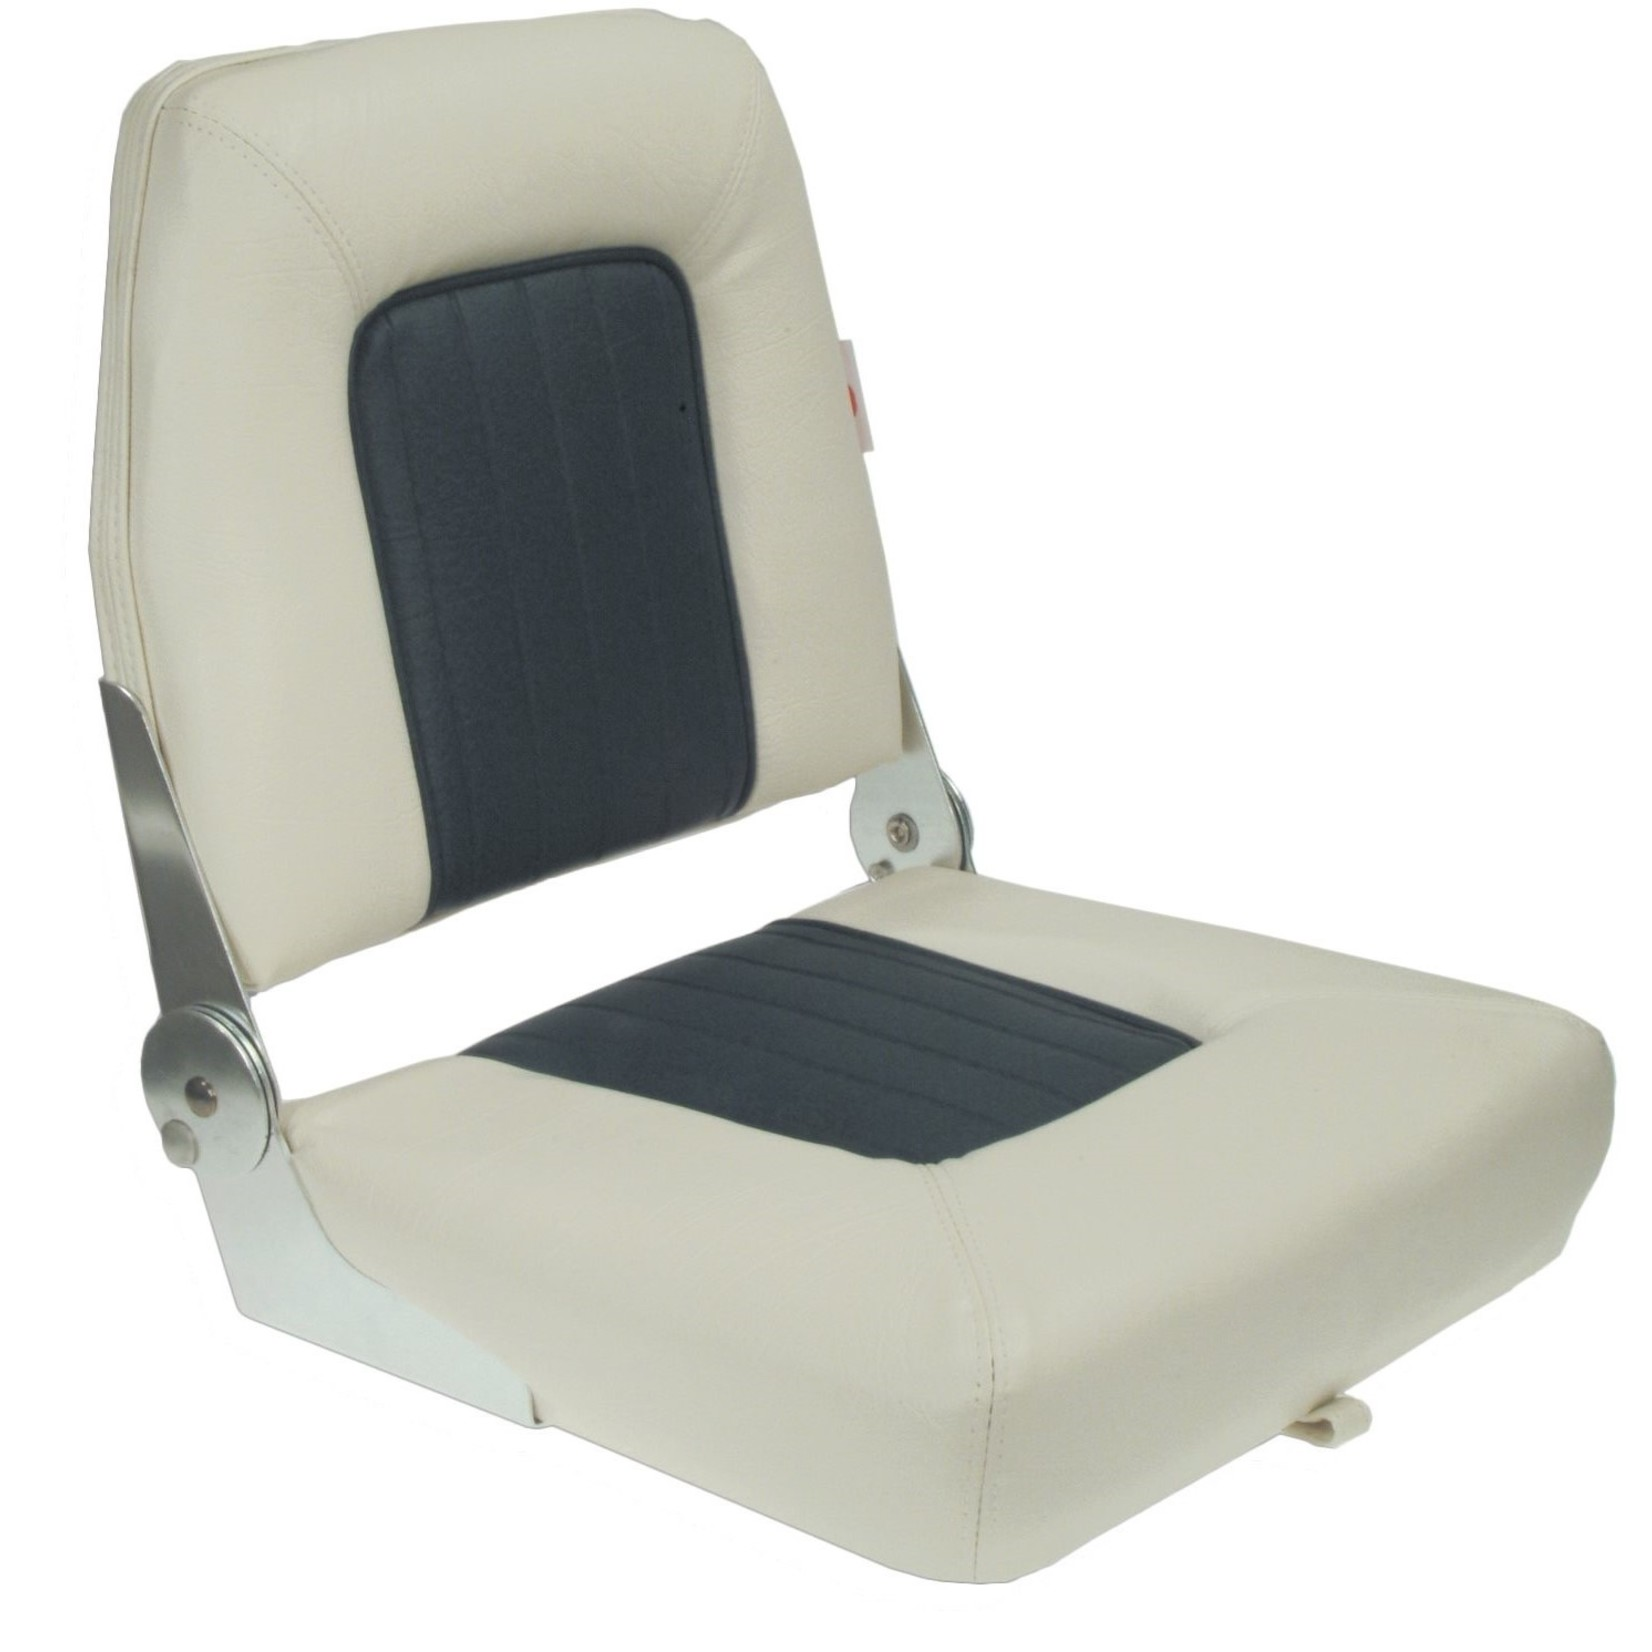 Allpa Coach - Folding Boat Seat